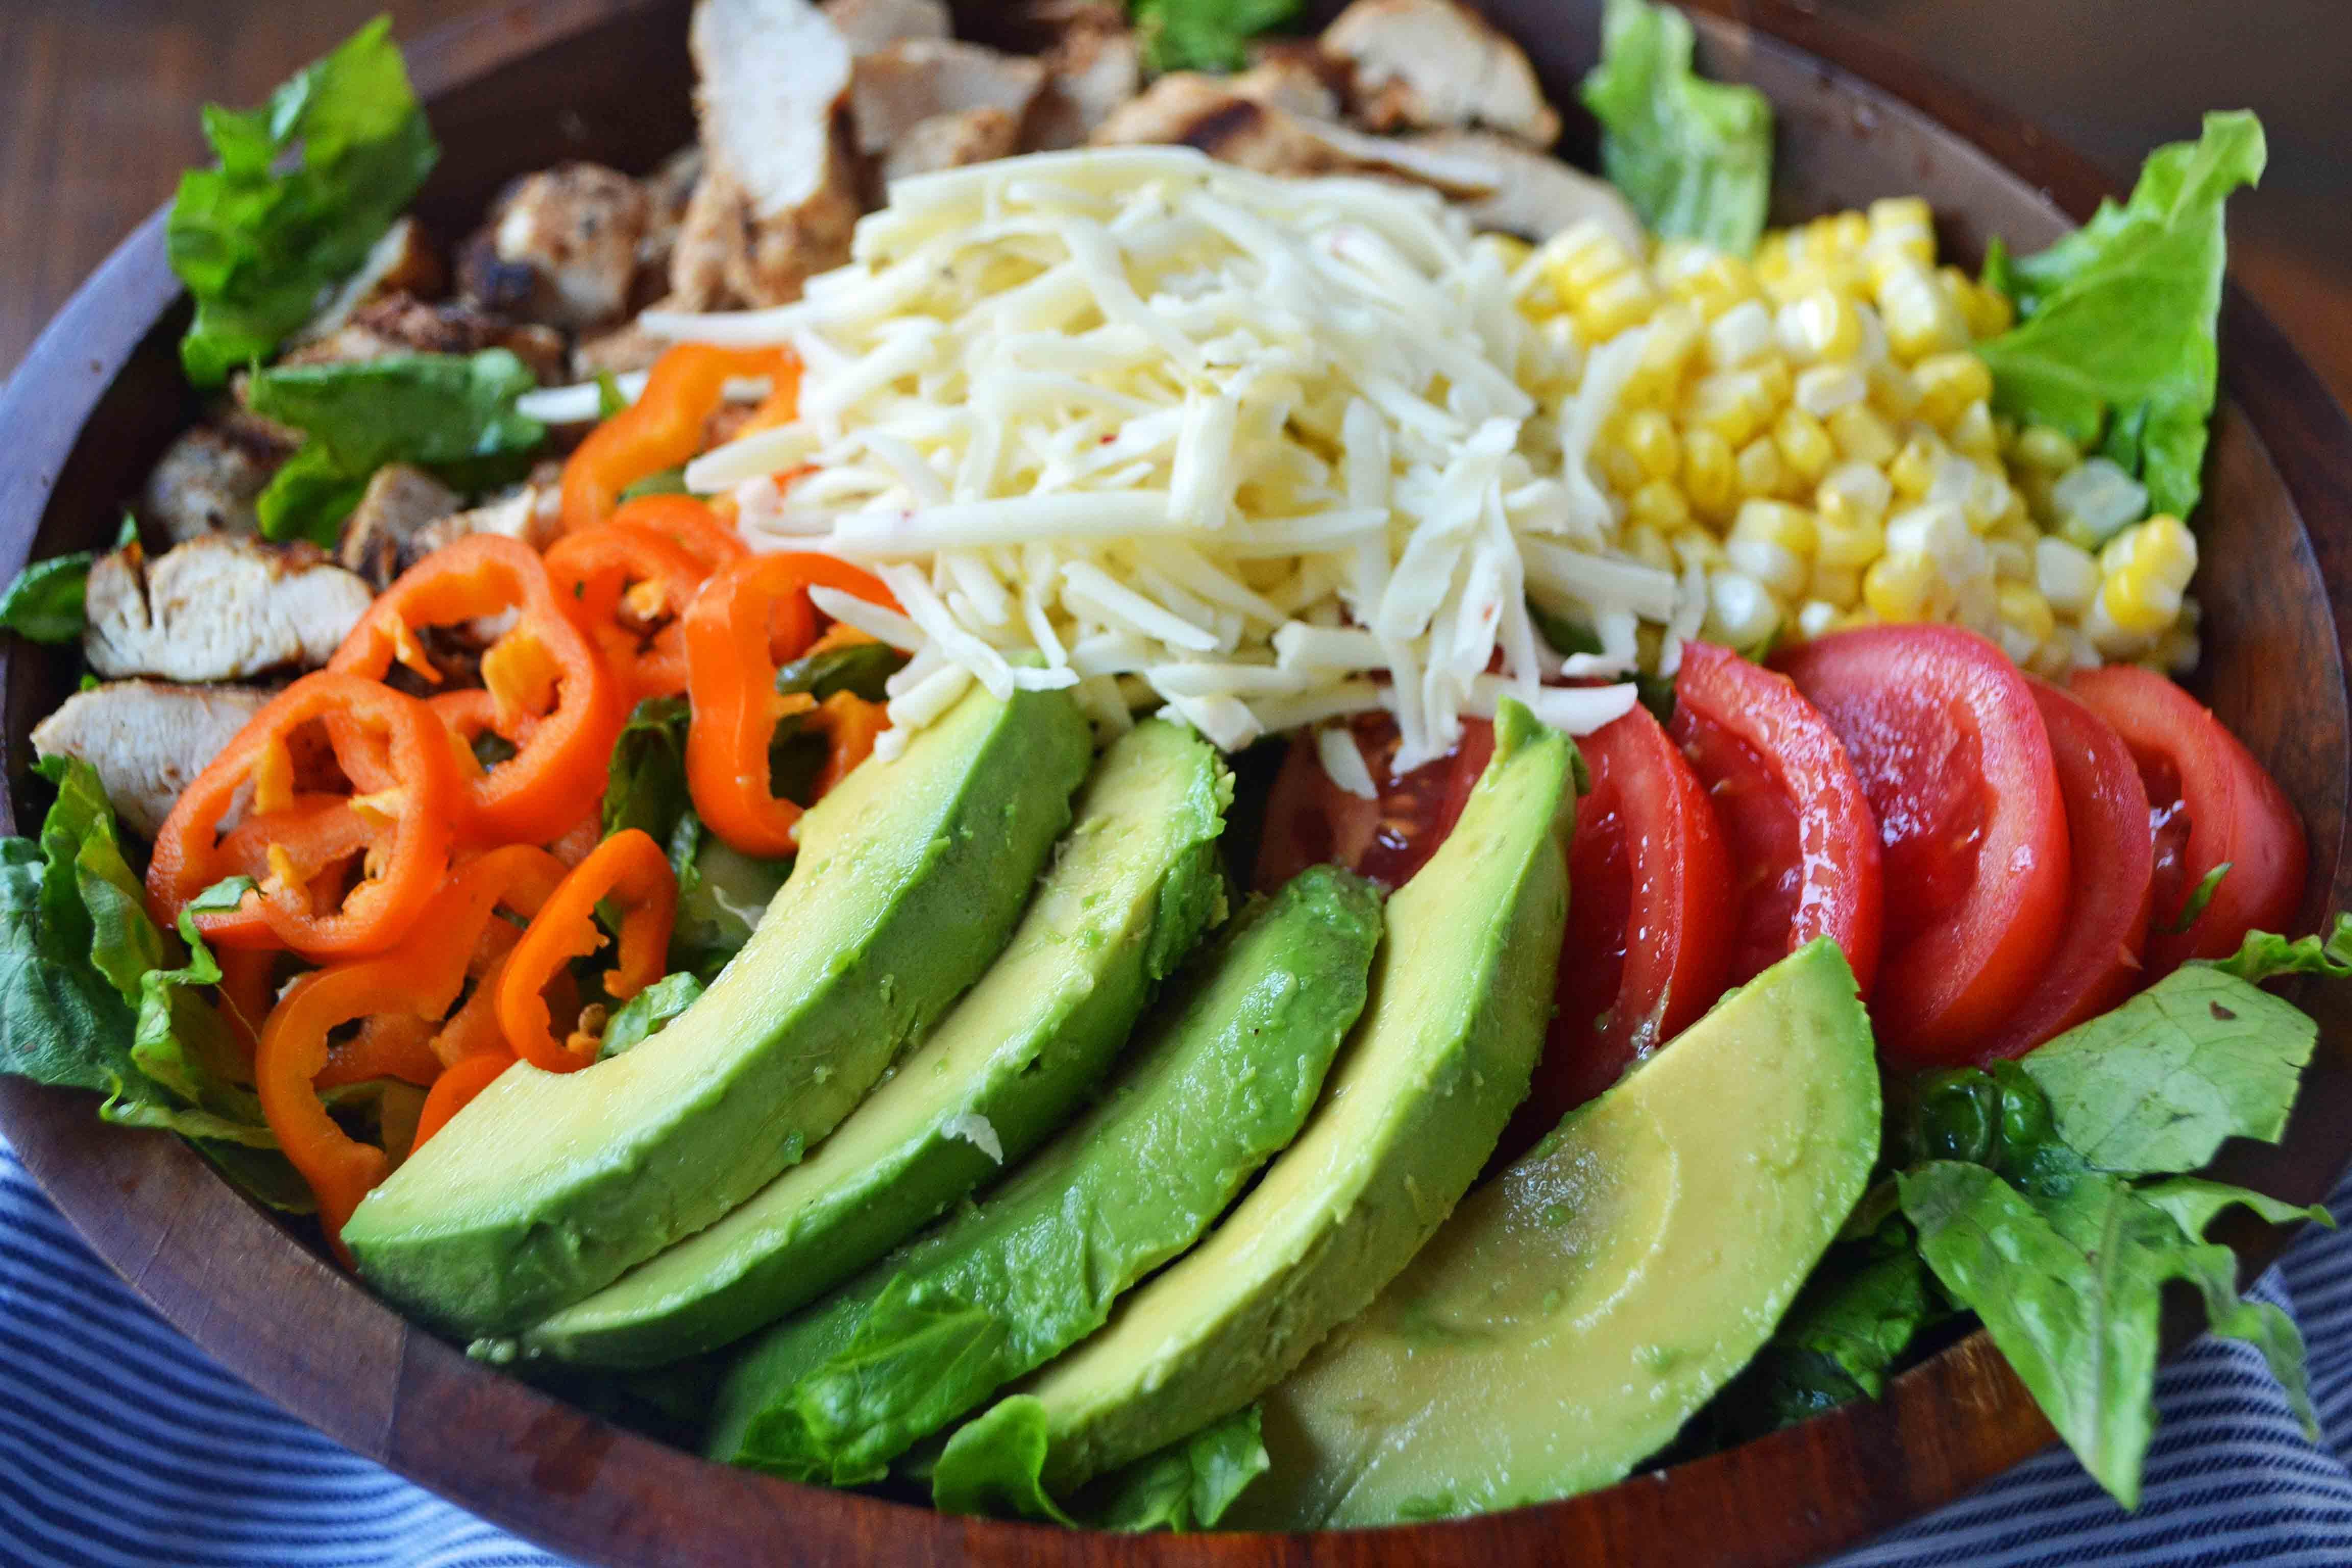 Southwestern Chicken Chopped Salad with Cilantro Lime Ranch by Modern Honey l www.modernhoney.com